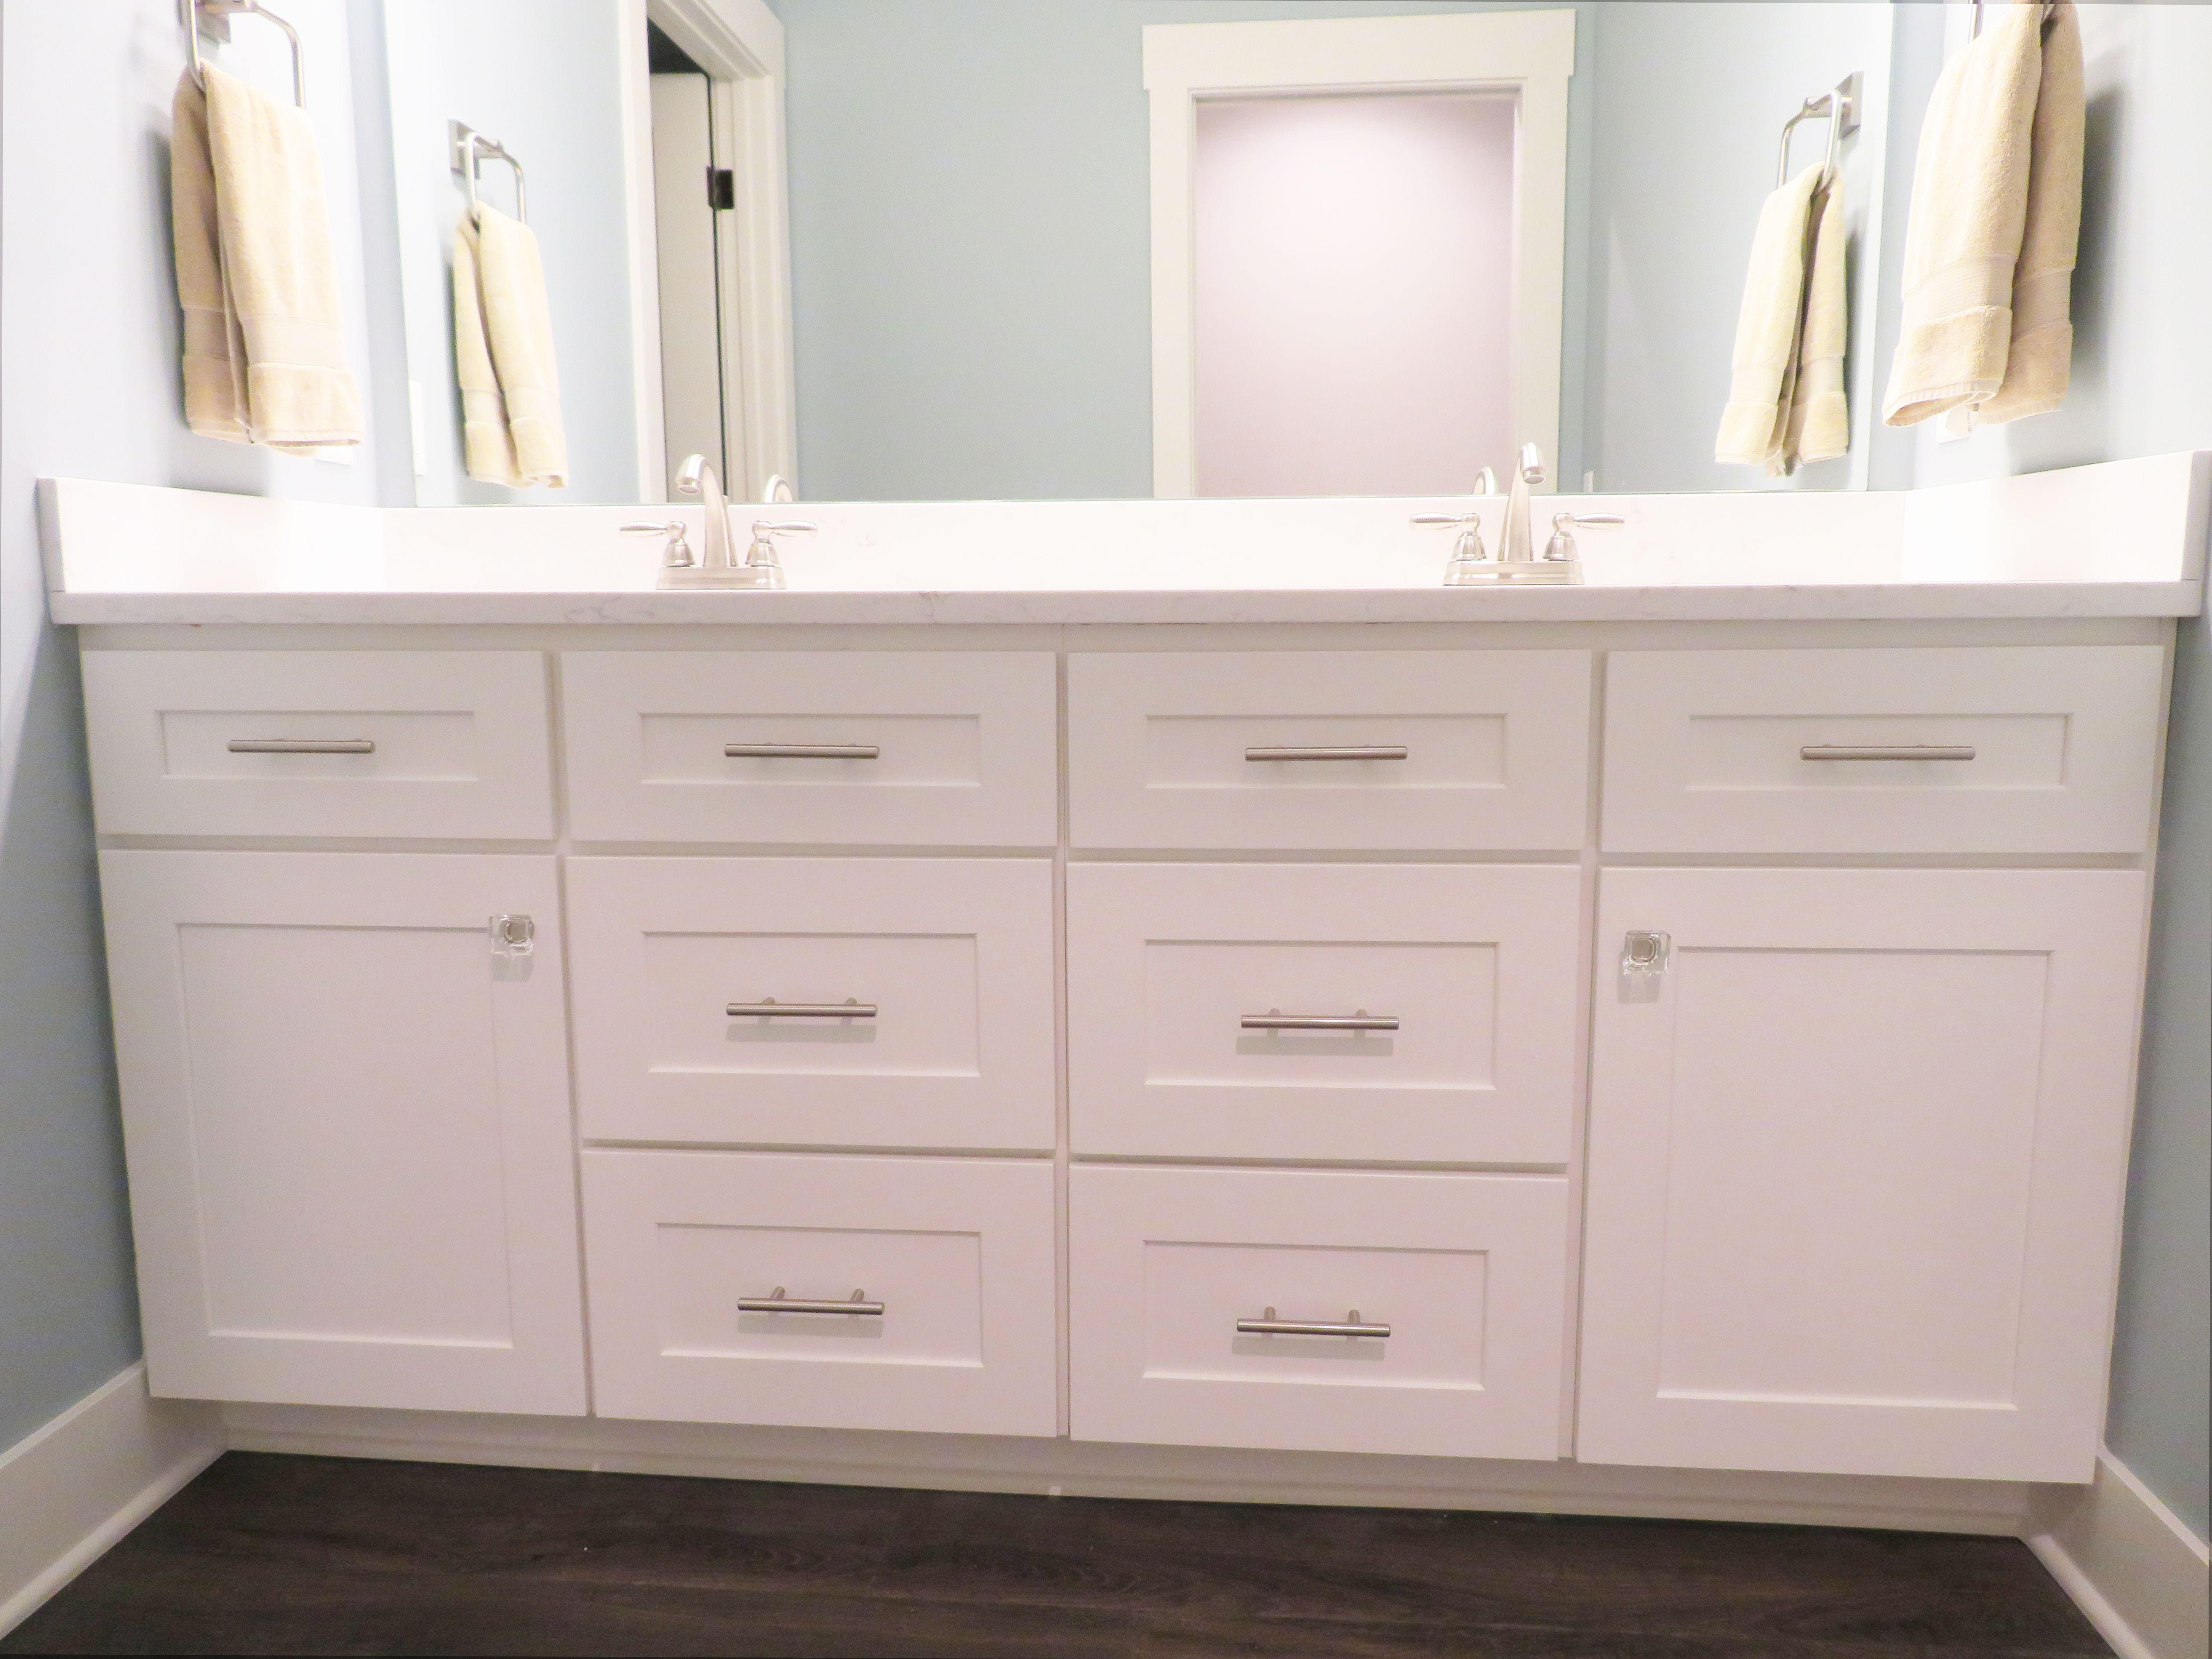 Cabinetry By River Run Desoto White Countertops By Vicostone In Misterio Bathroom Layout Kitchen And Bath Design Bathroom Design